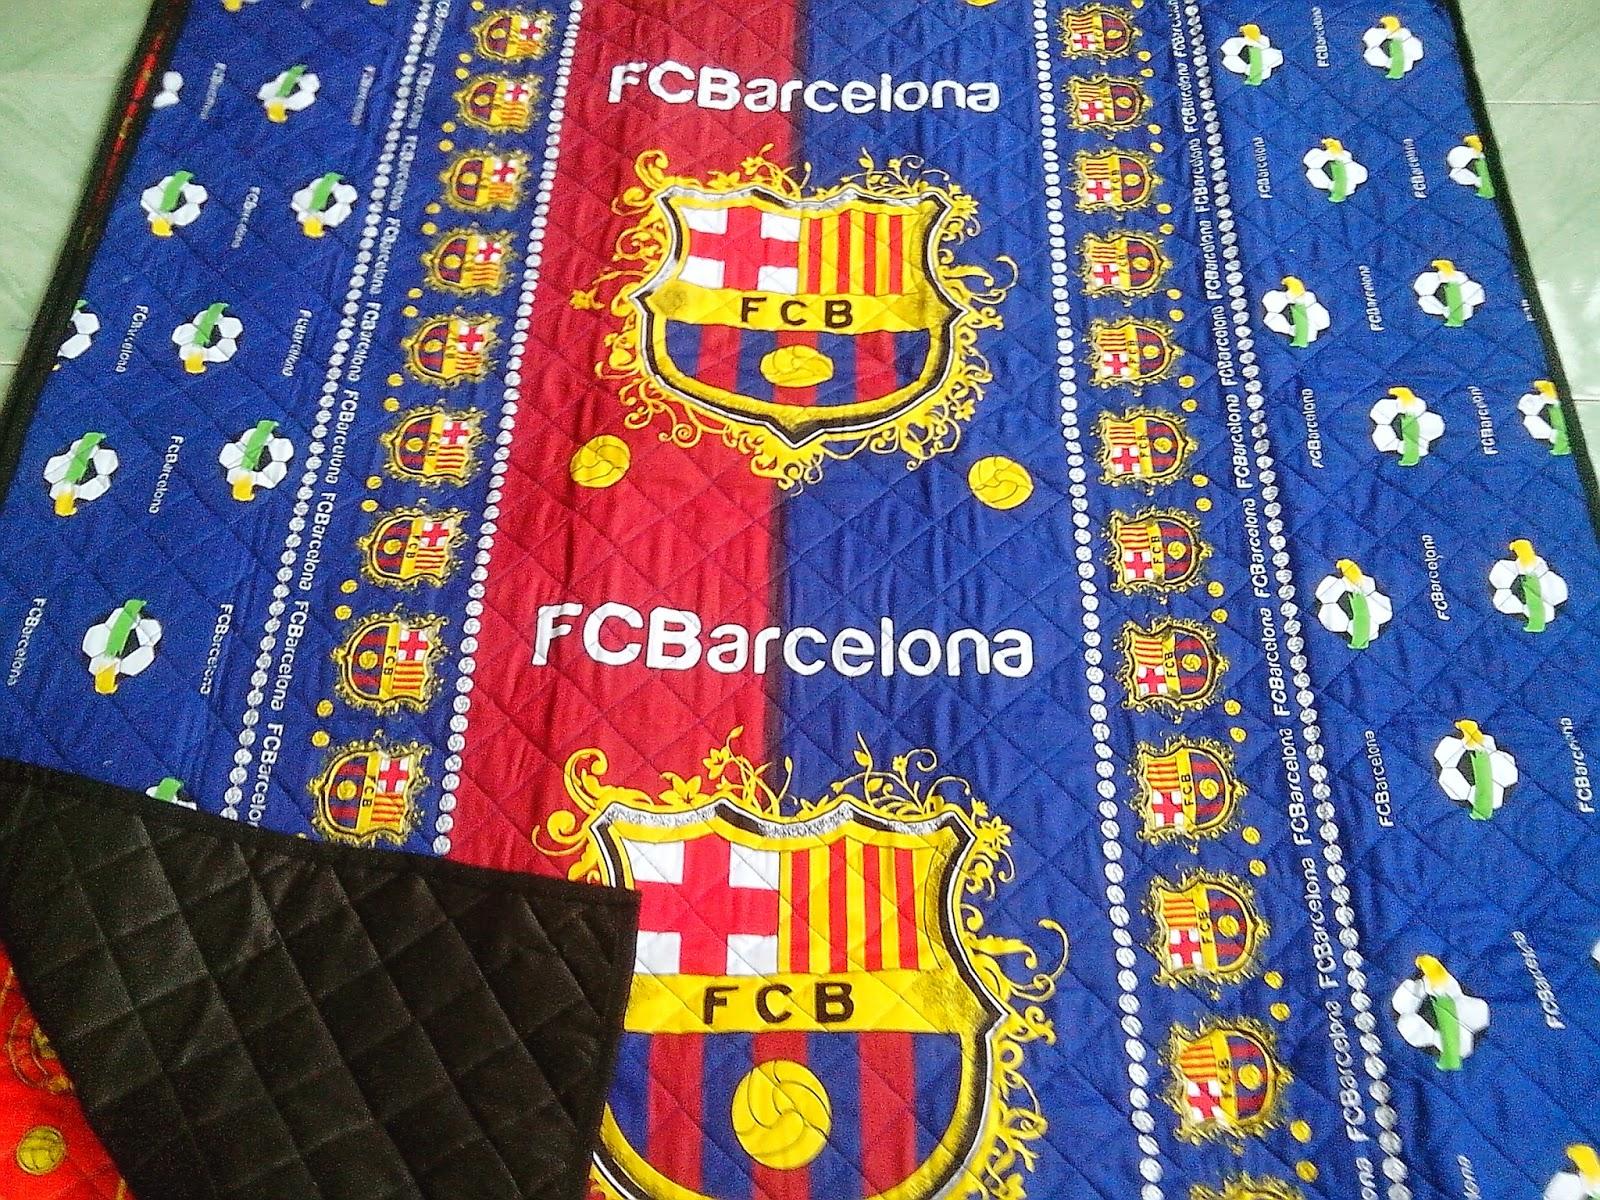 tikar dakron motif barcelona1